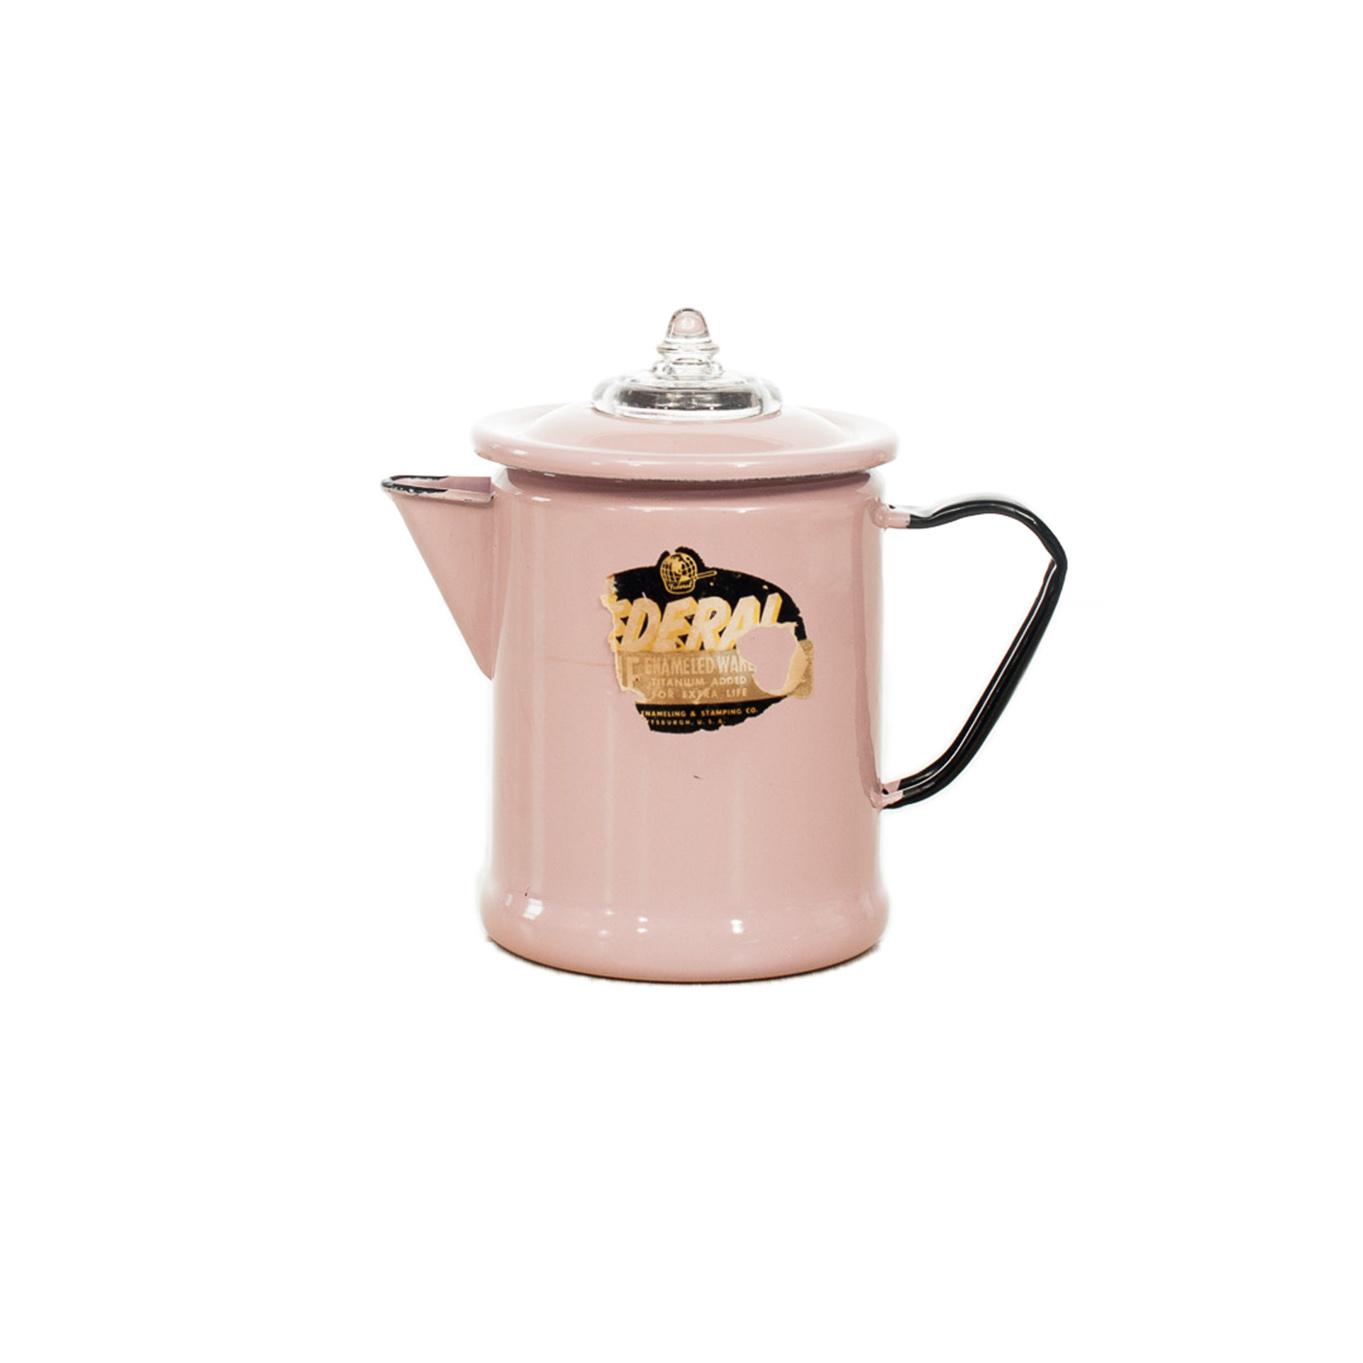 Pink Enamel Coffee Pot